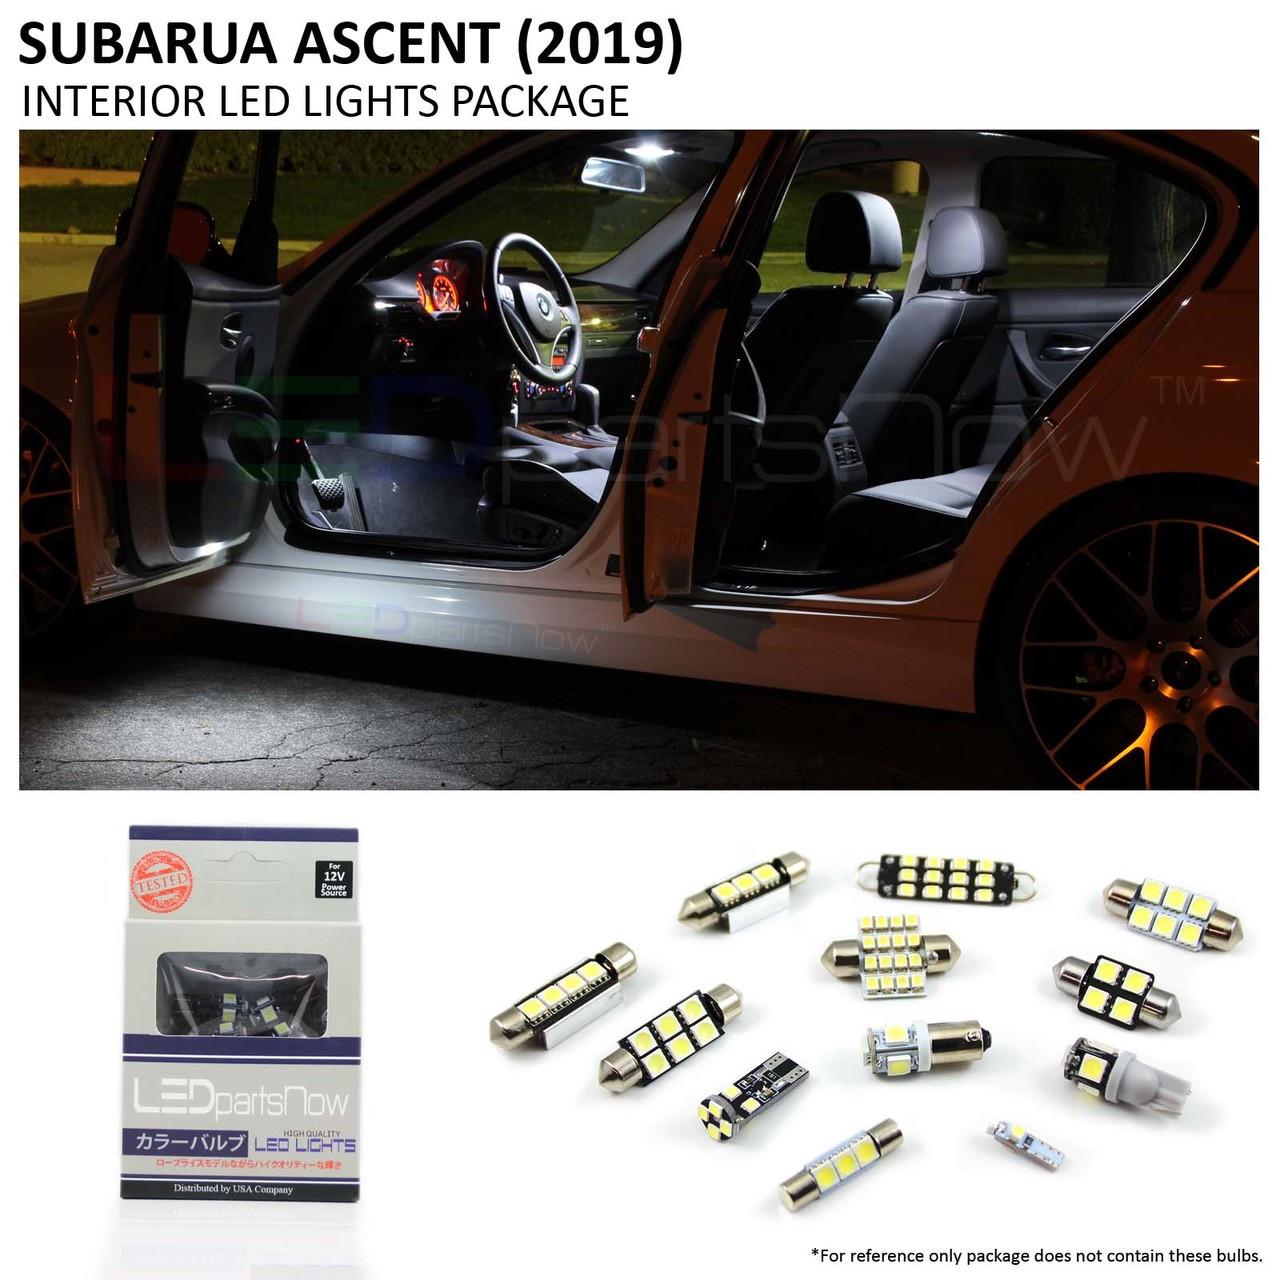 2019 Subaru Ascent Interior LED Lights Package